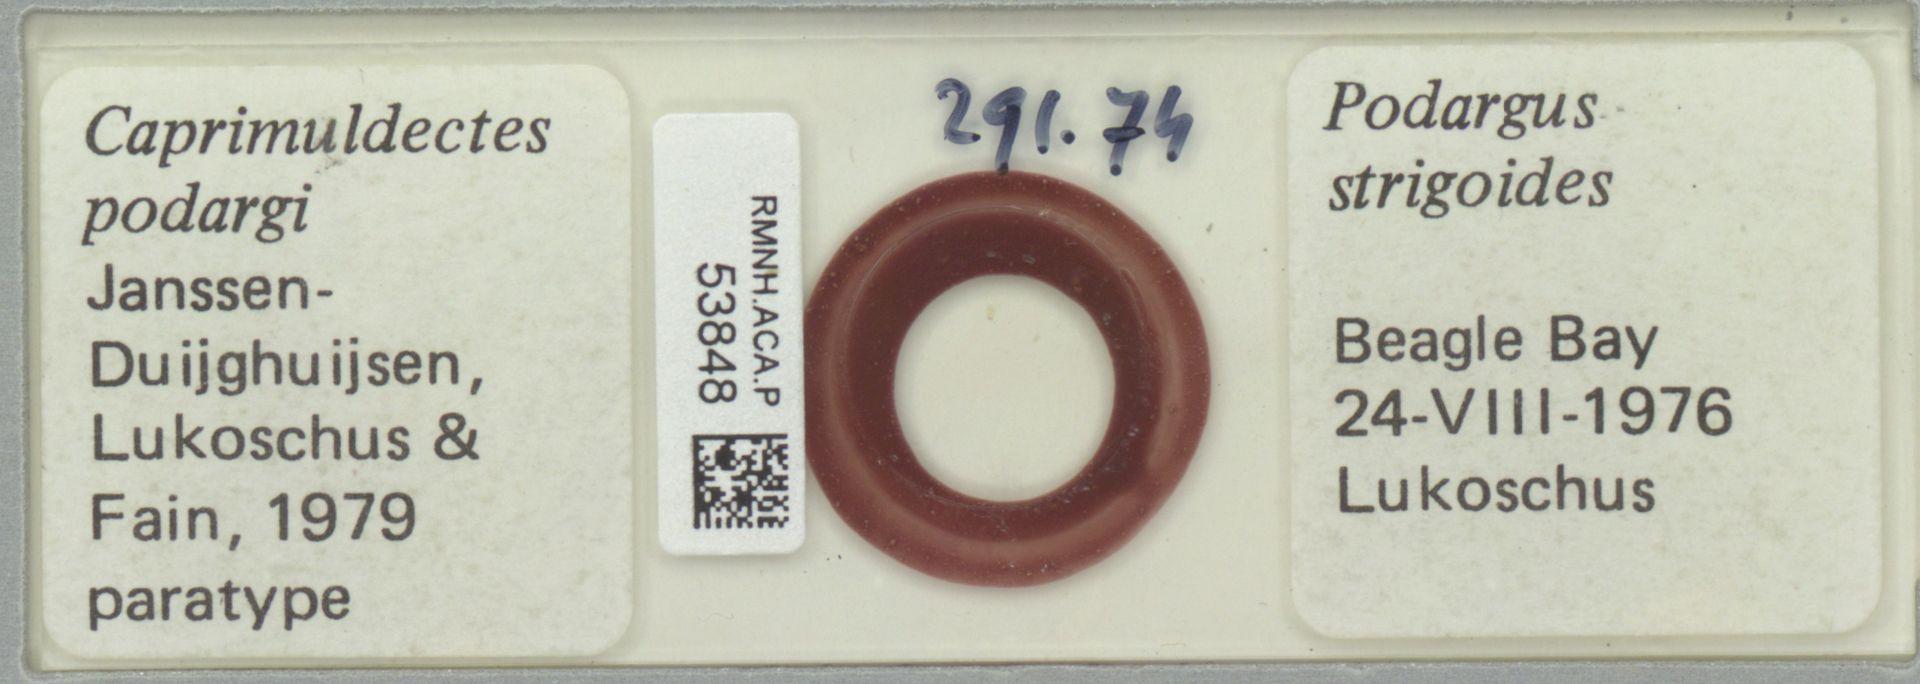 RMNH.ACA.P.53848   Caprimuldectes podargi Janssen-Duijghuijsen, Lukoschus & Fain, 1979